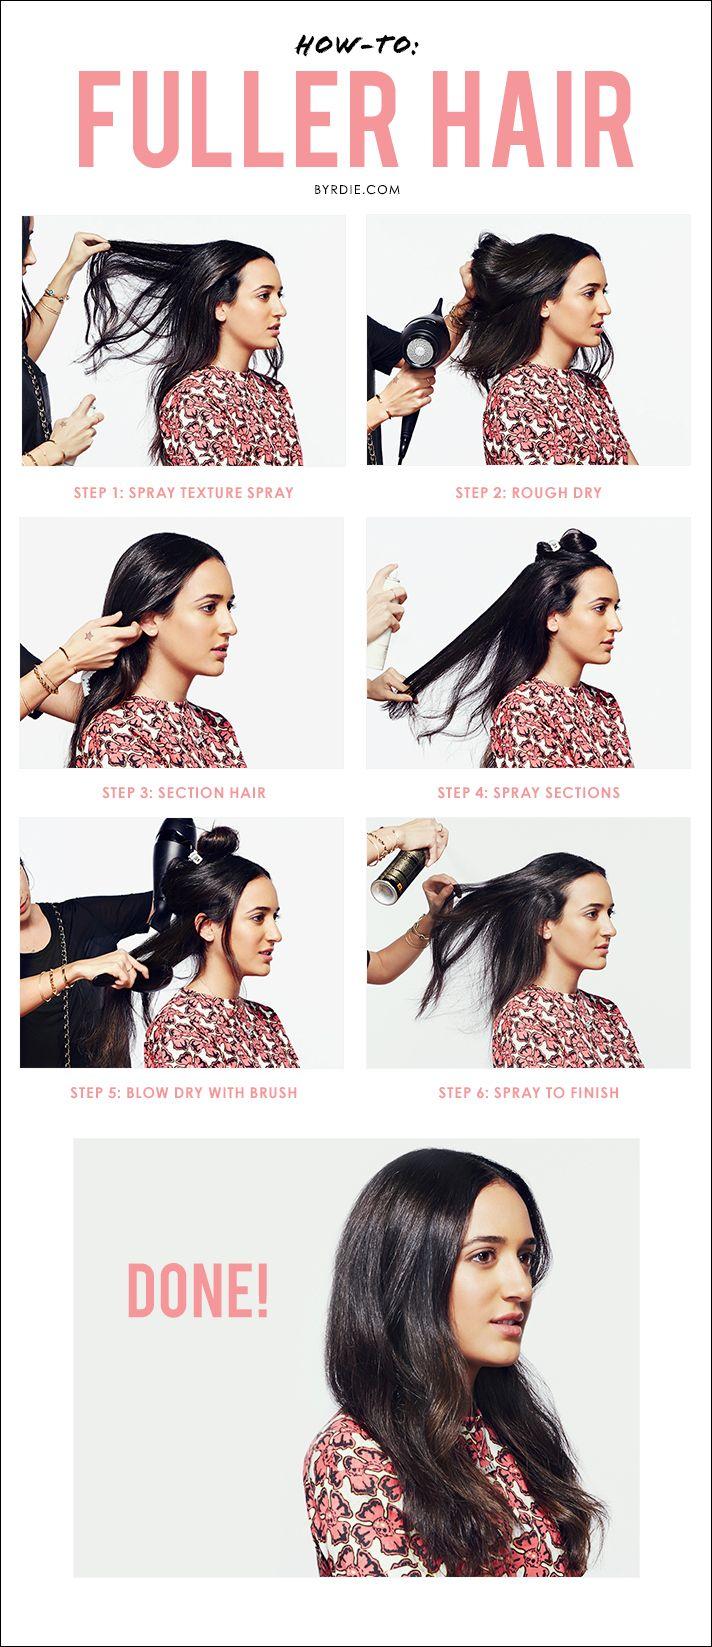 How To Get Fuller Hair In 6 Easy Steps